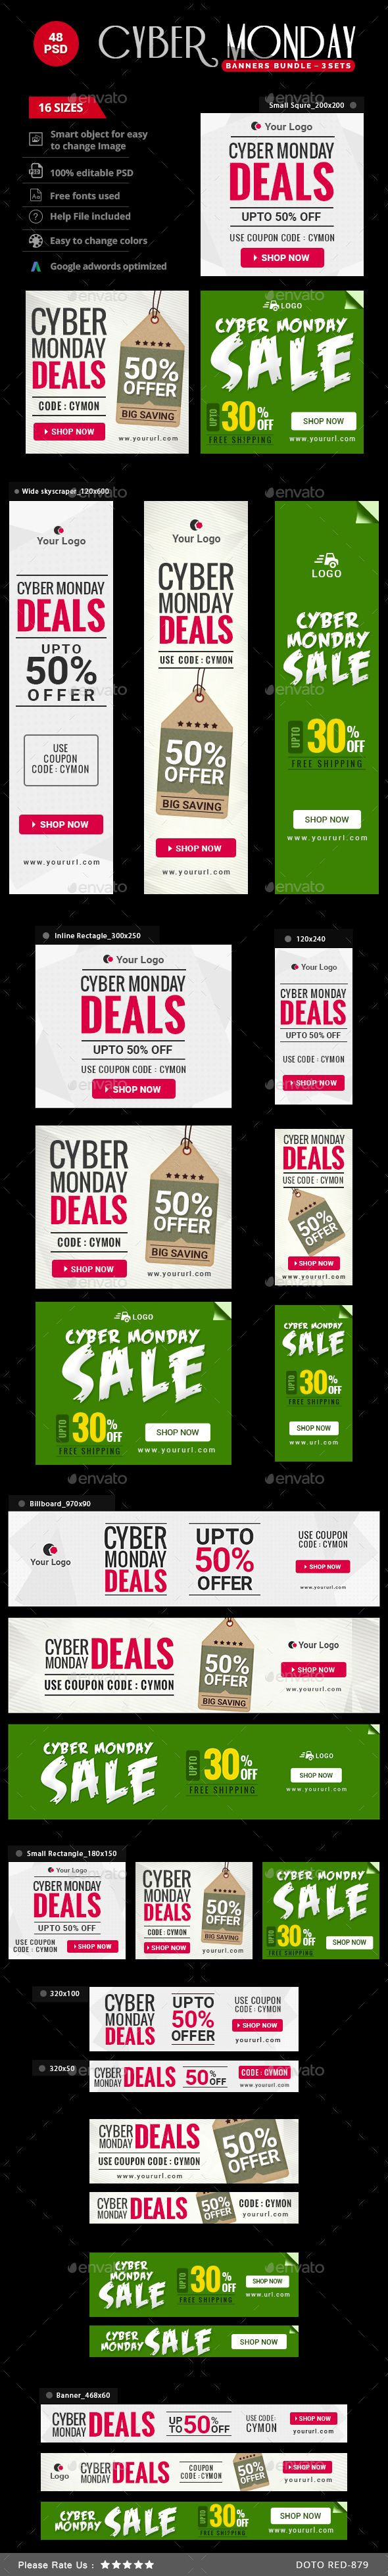 Cyber Monday Sale Web Banners Bundle - 3 Sets Templates PSD #design #ads Download: http://graphicriver.net/item/cyber-monday-sale-banners-bundle-3-sets/13841998?ref=ksioks